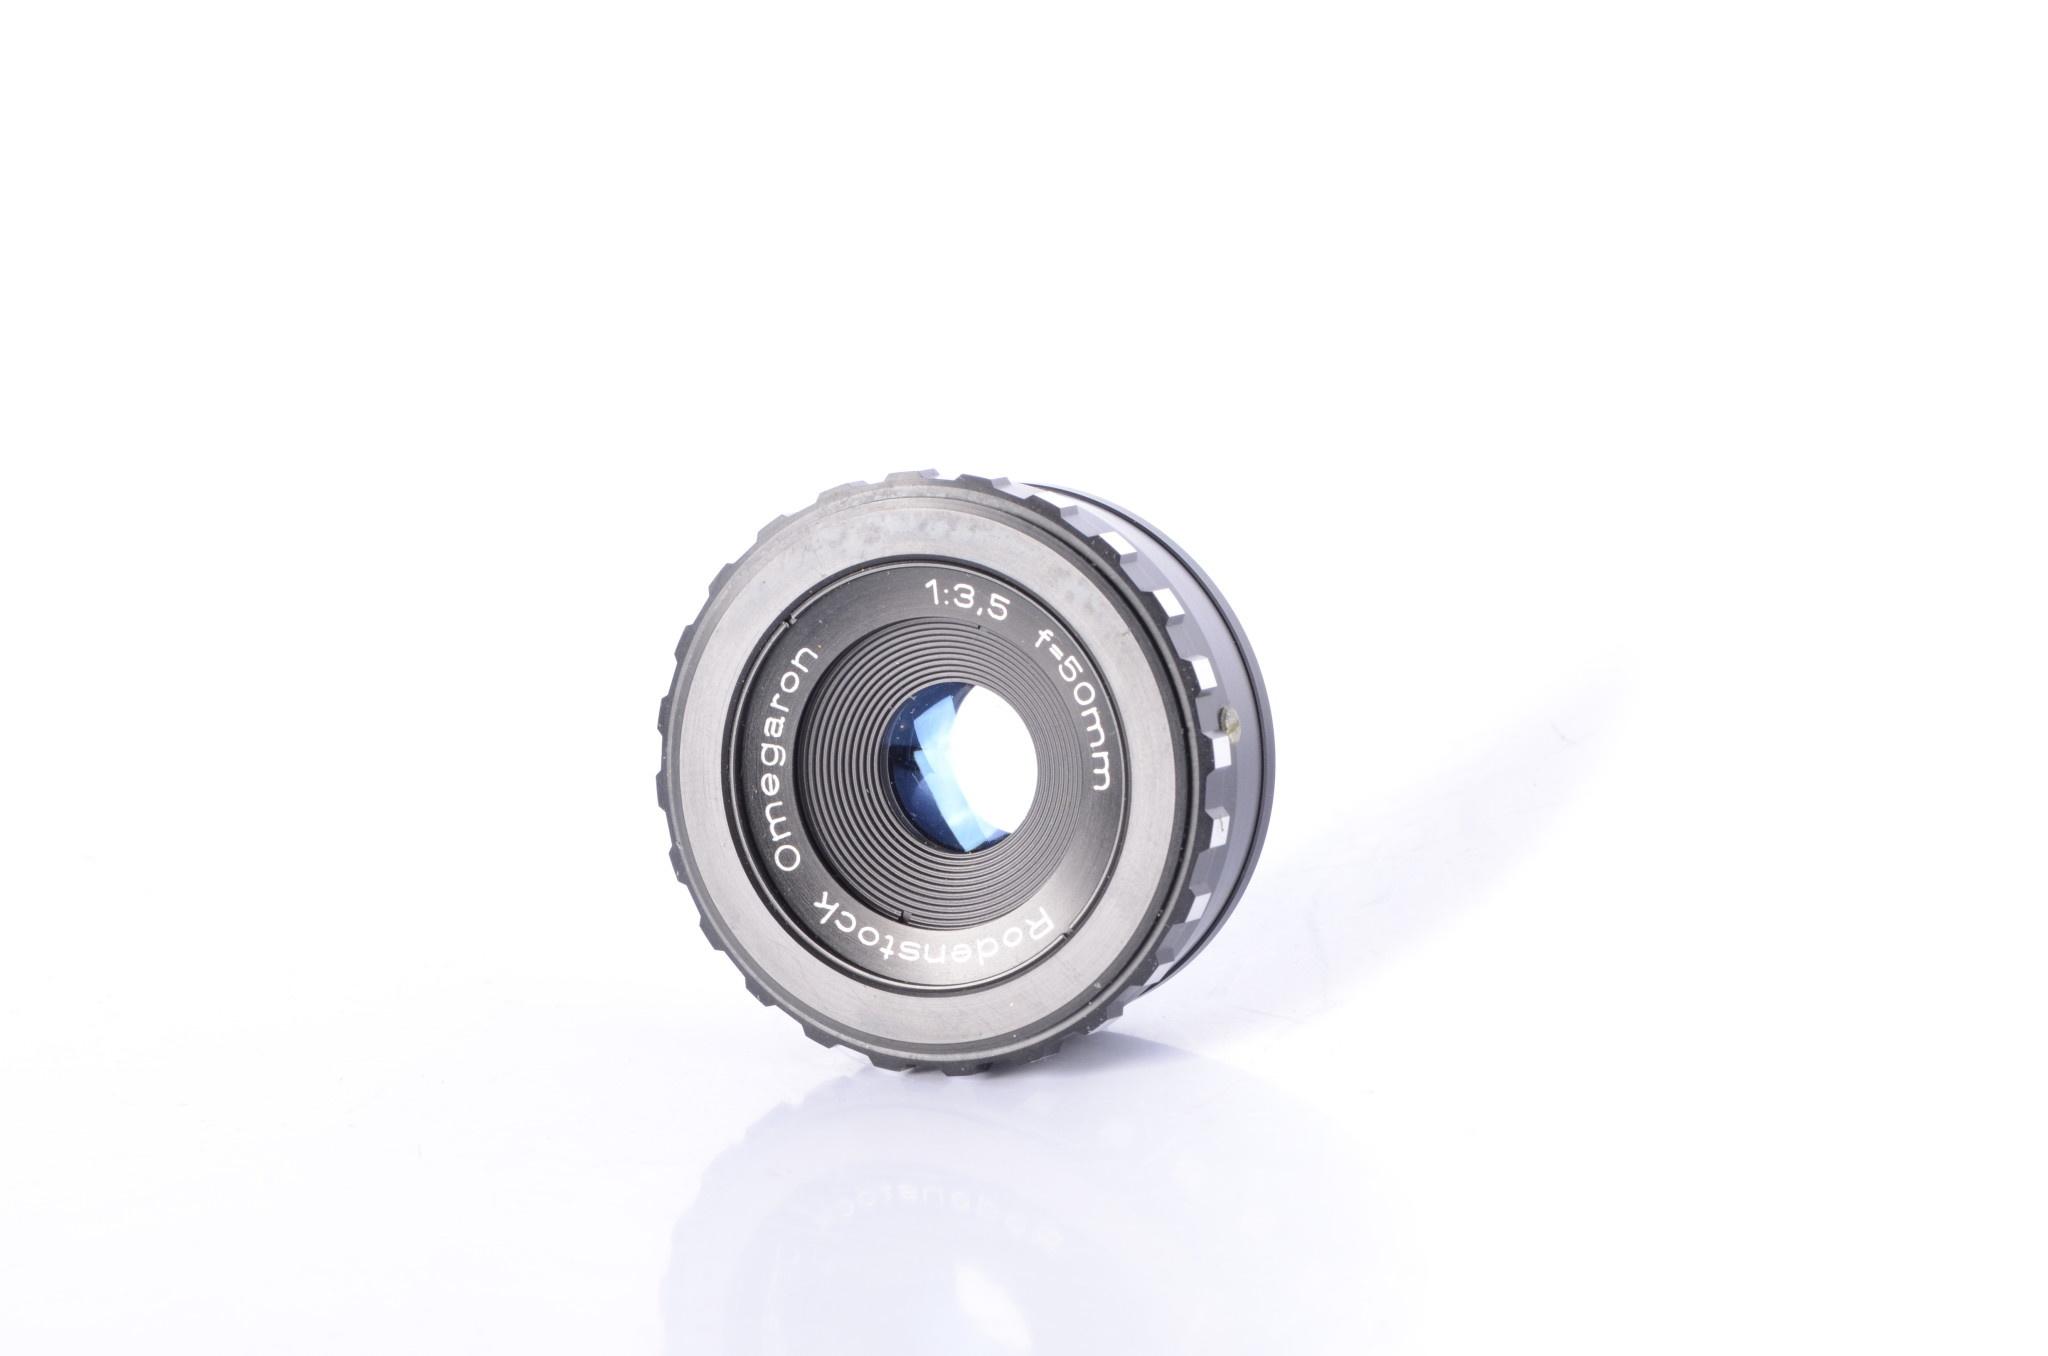 Rodenstock Rodenstock-Omegaron 50mm f/3.5 Enlarging Lens